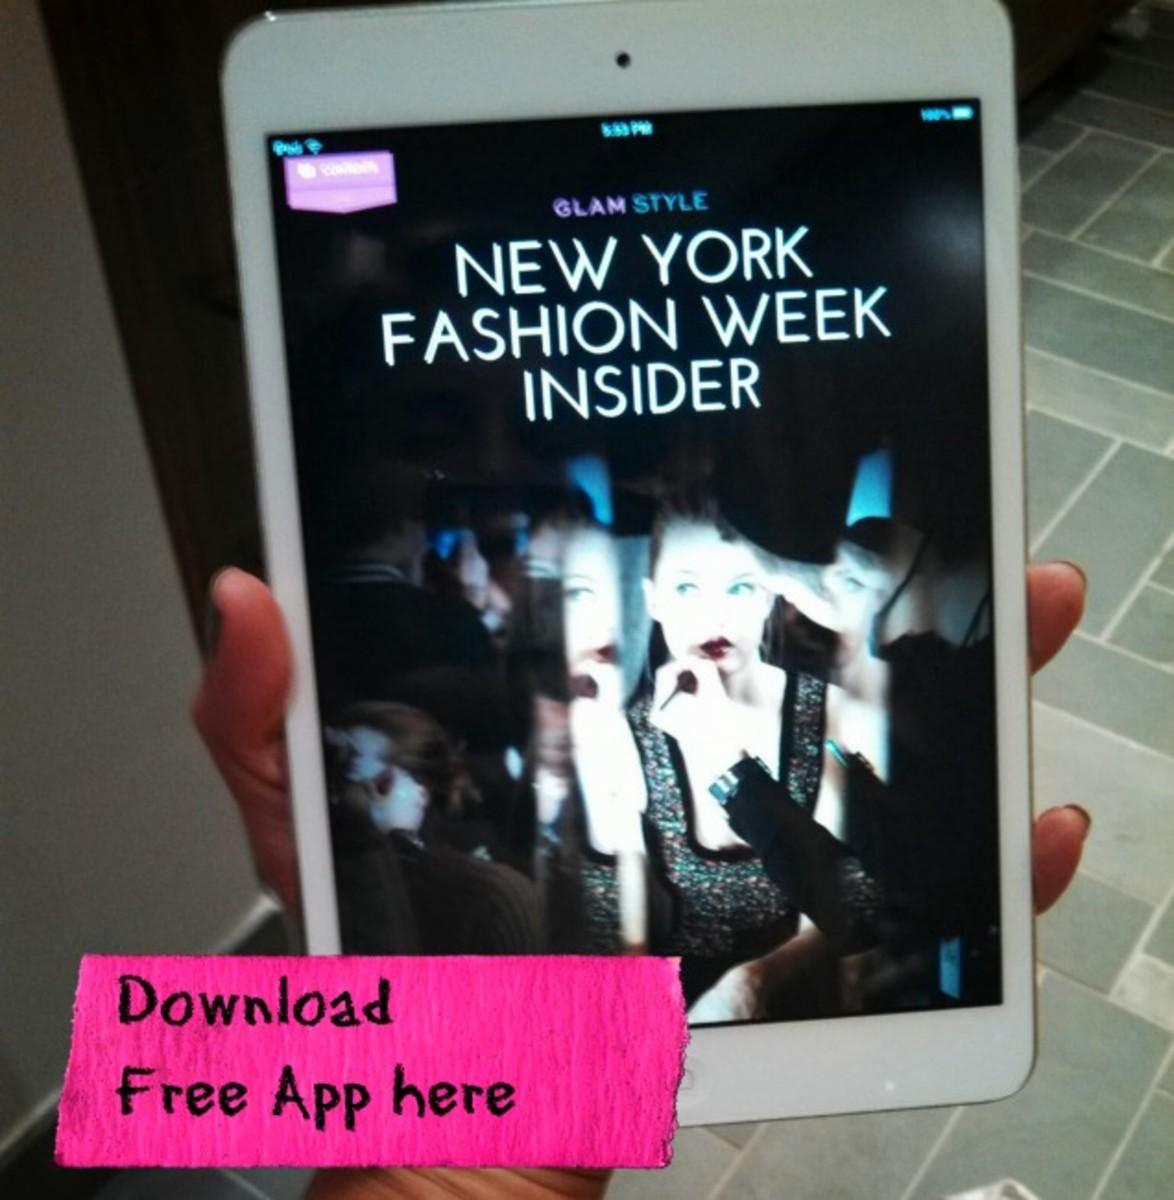 glam style free app